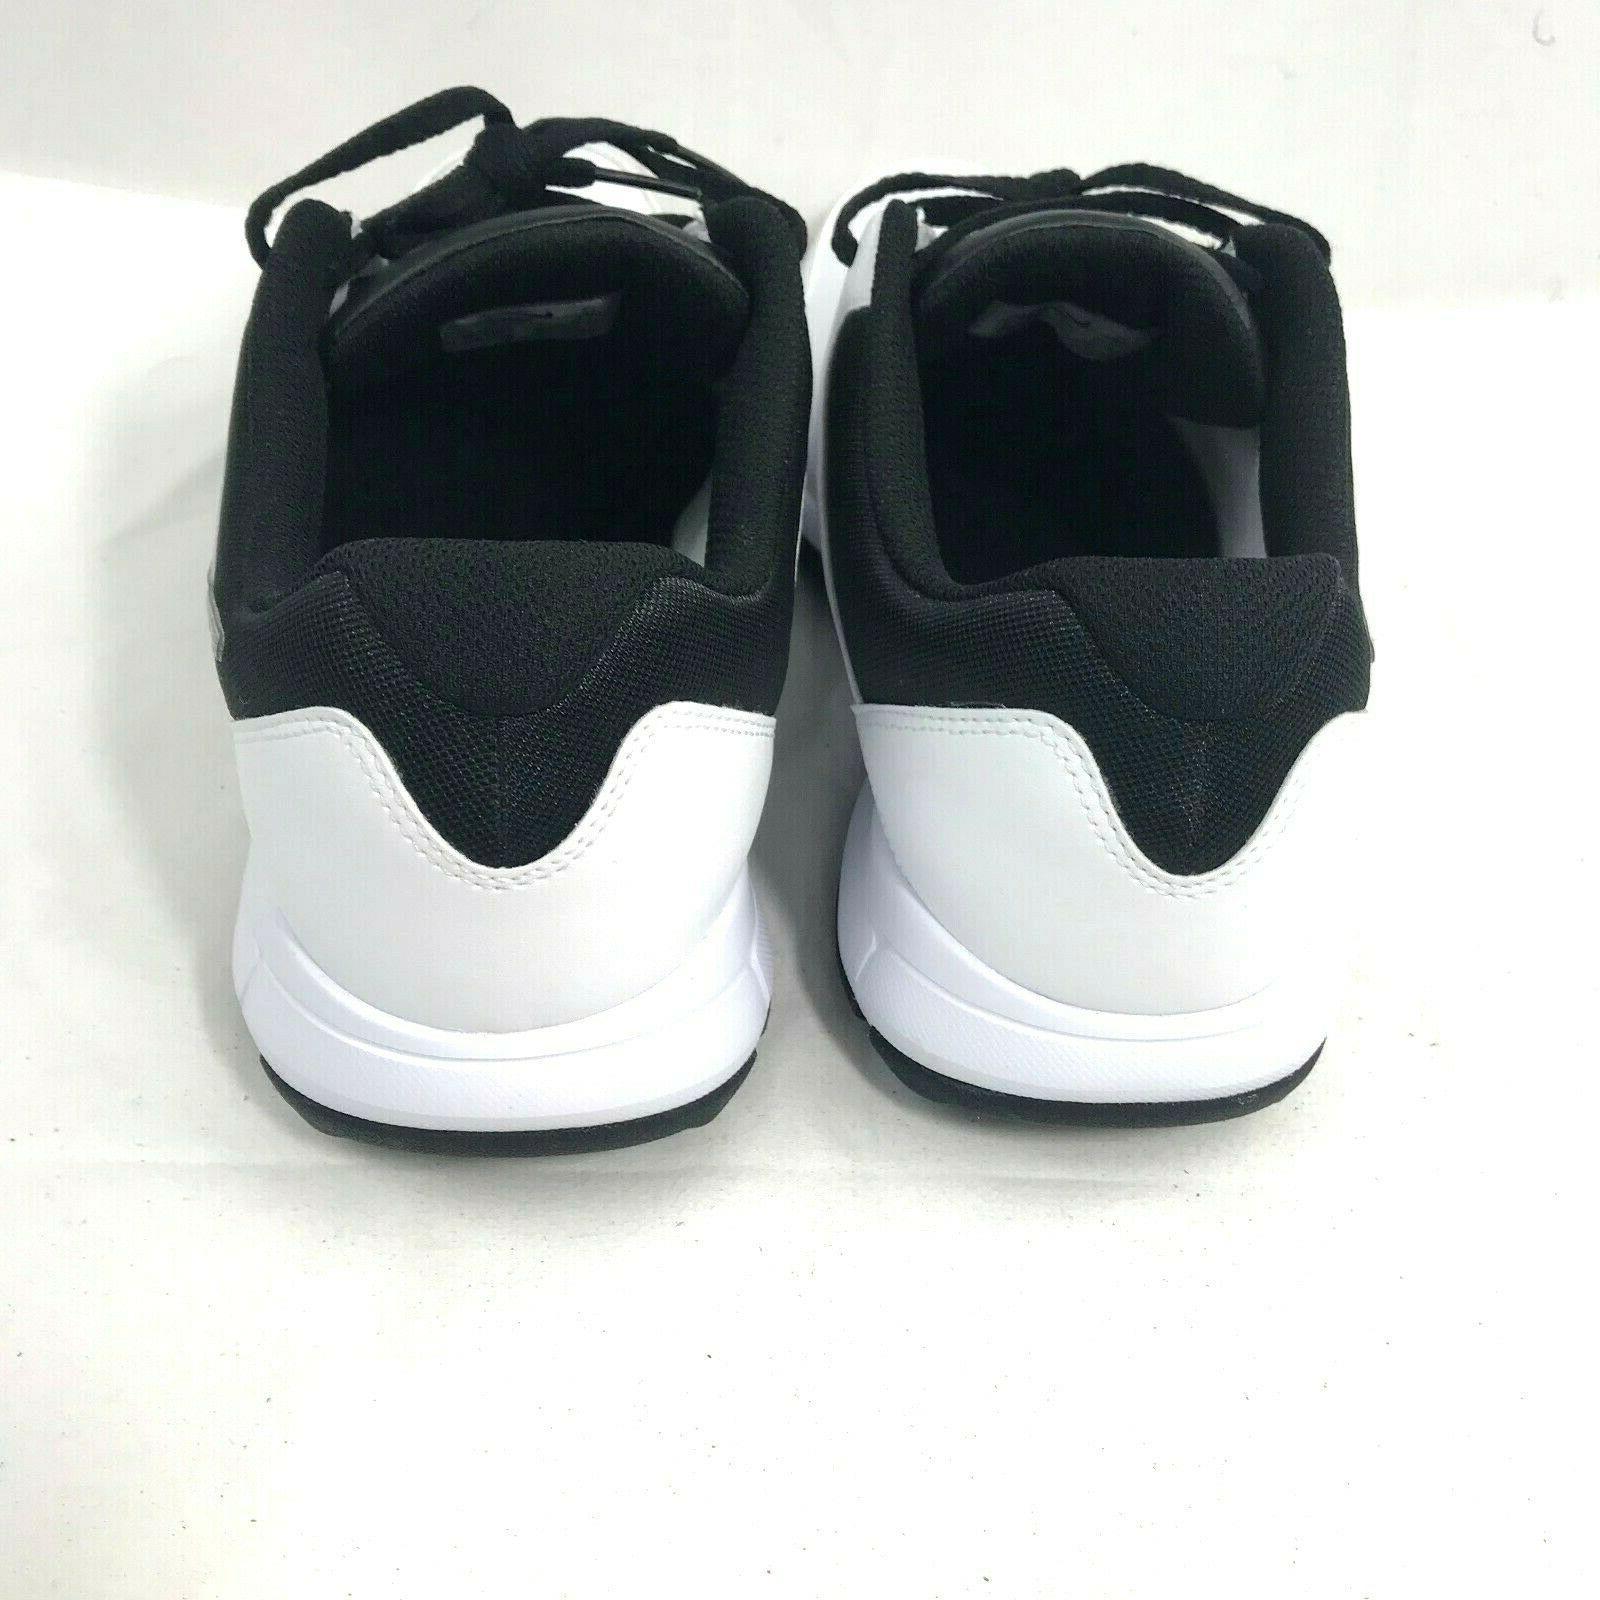 Nike Golf Shoes Wide Width White Black 844551